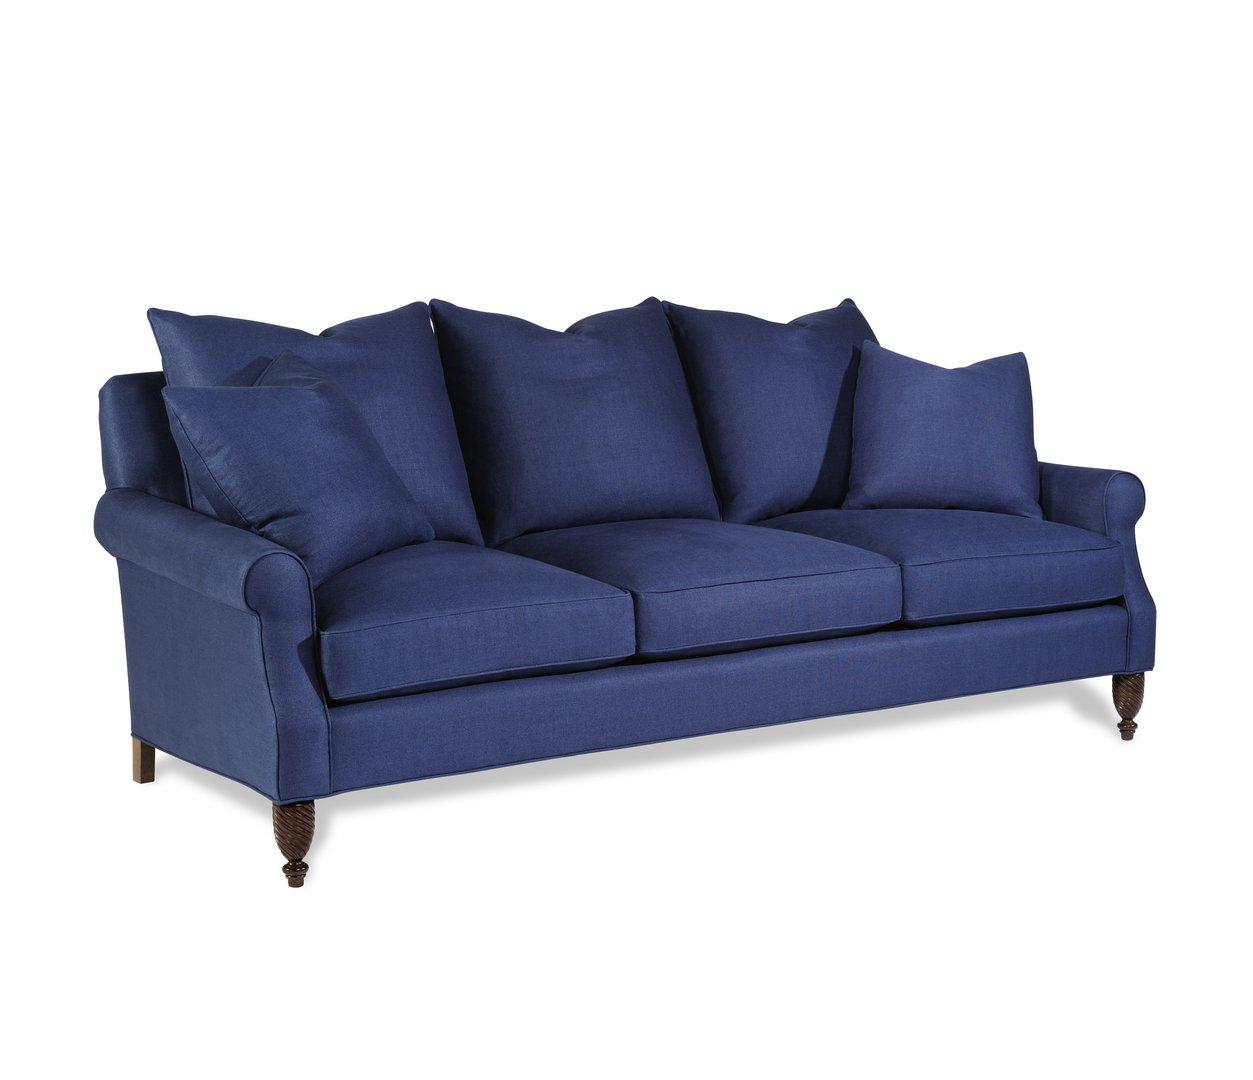 Oscar Sofa Image